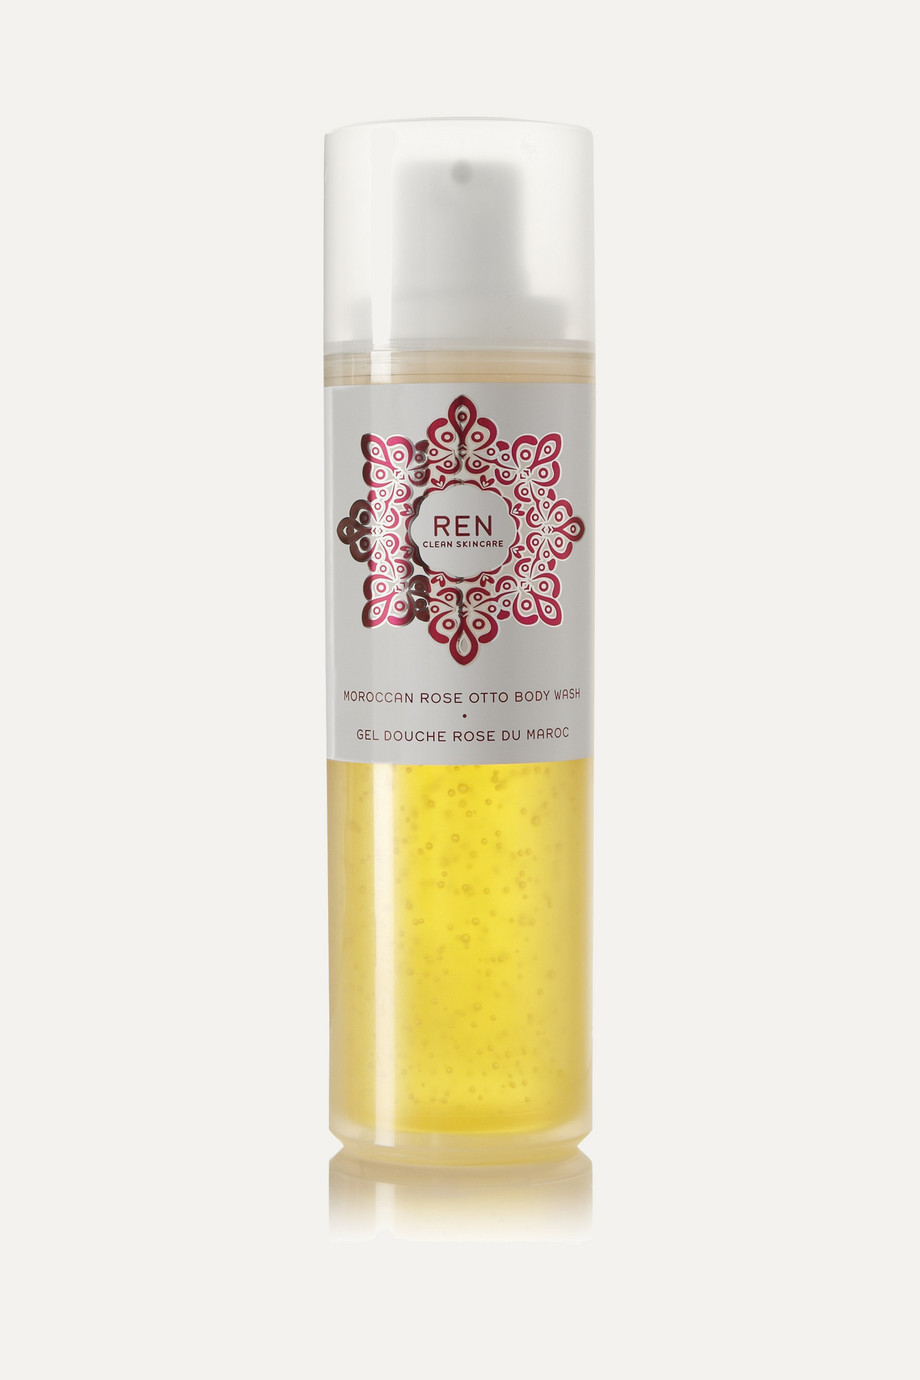 Moroccan Rose Otto Body Wash, 200ml, by Ren Skincare